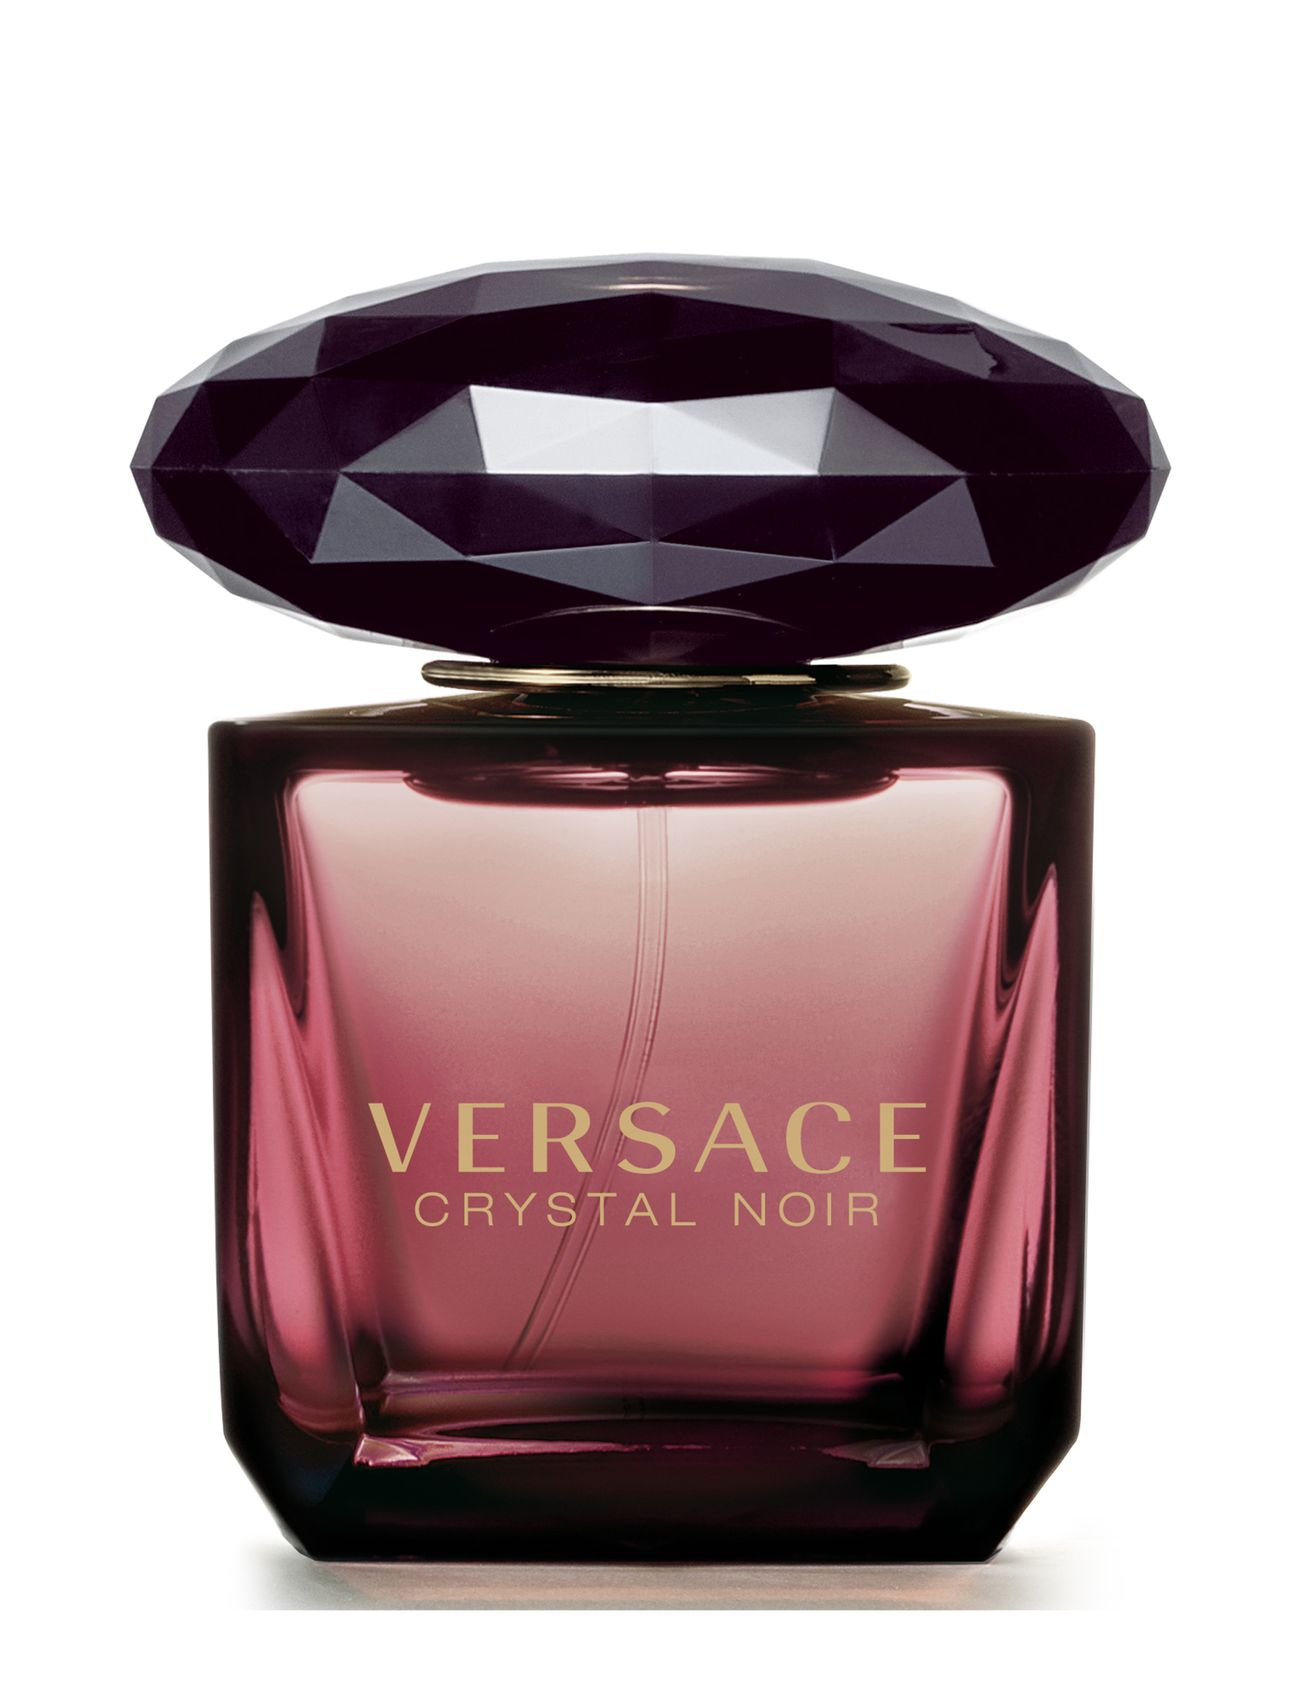 versace fragrance – Versace crystal noir eau de toilett på boozt.com dk